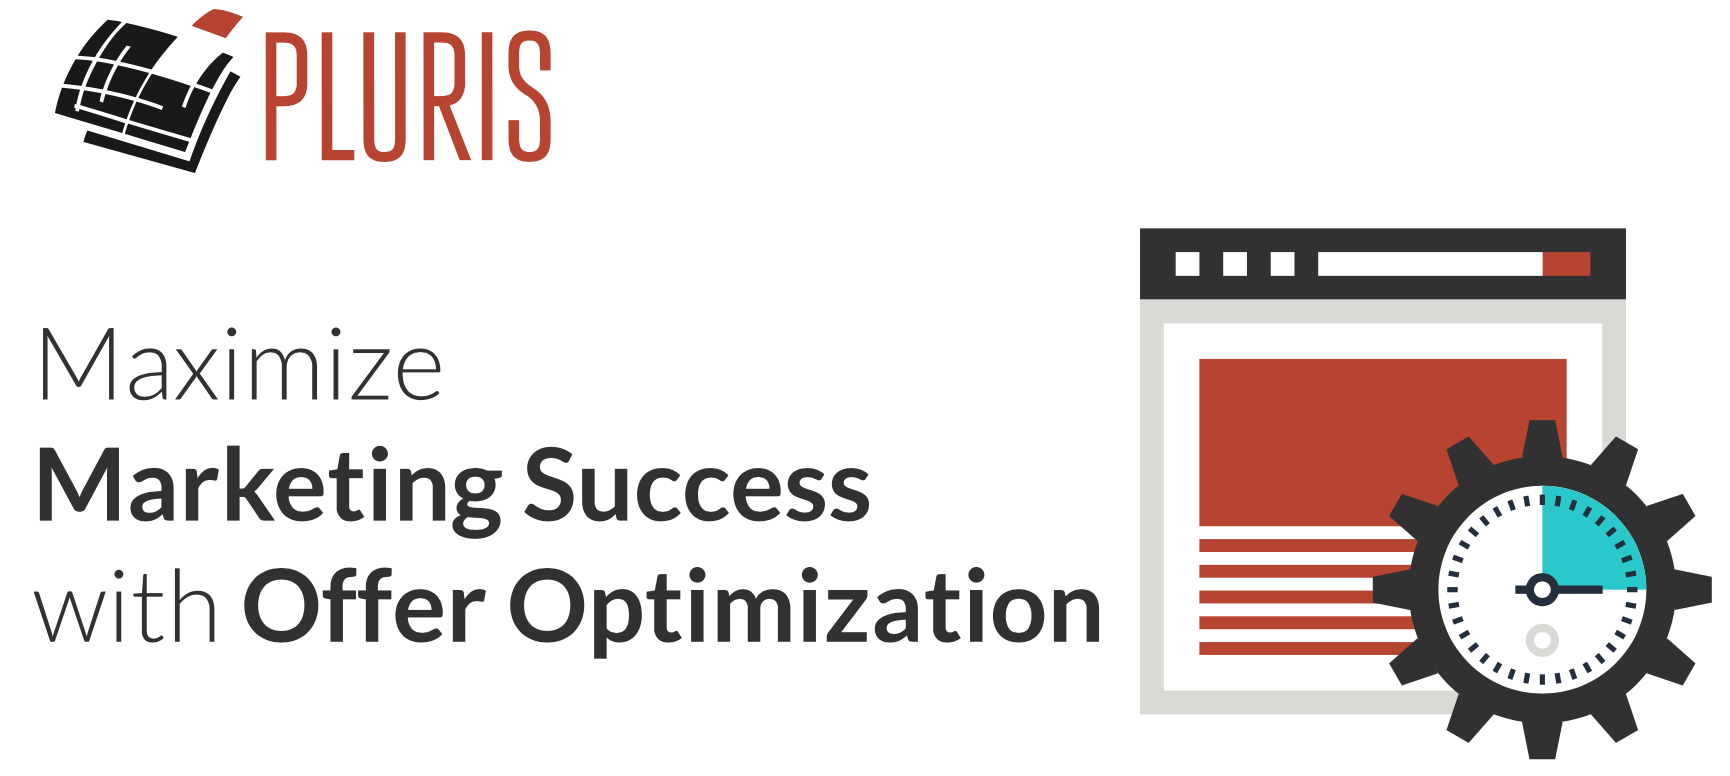 Offer Optimization Thumbnail.png